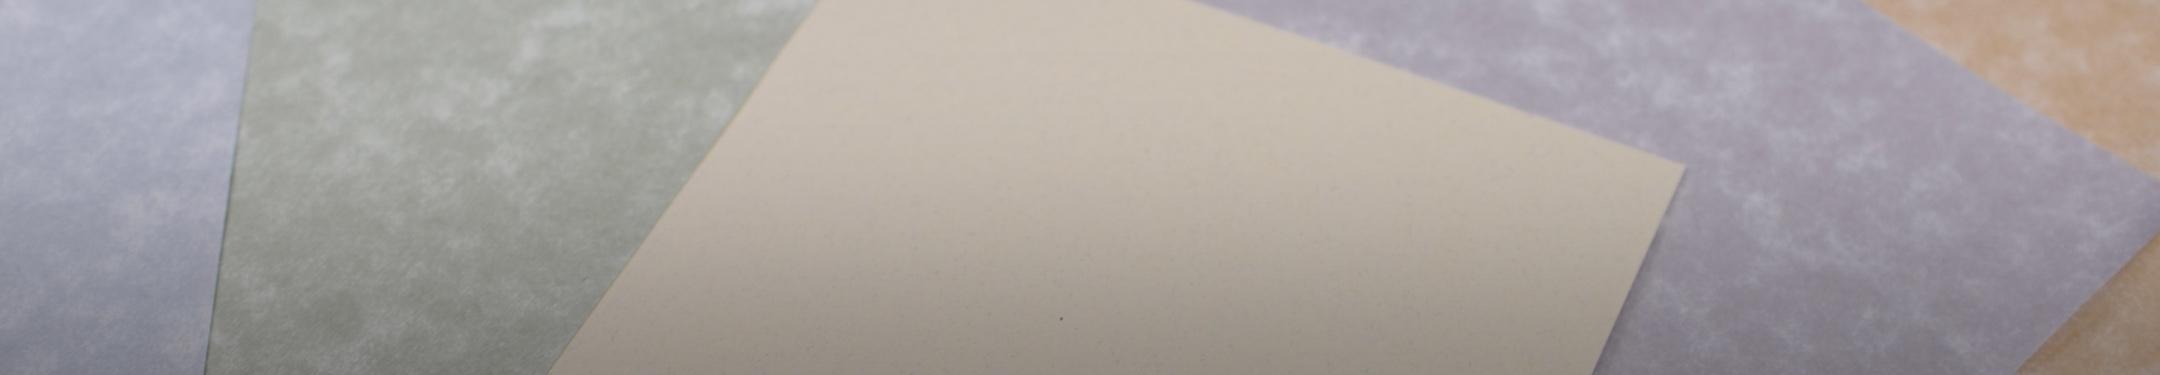 Parchment Card Stock